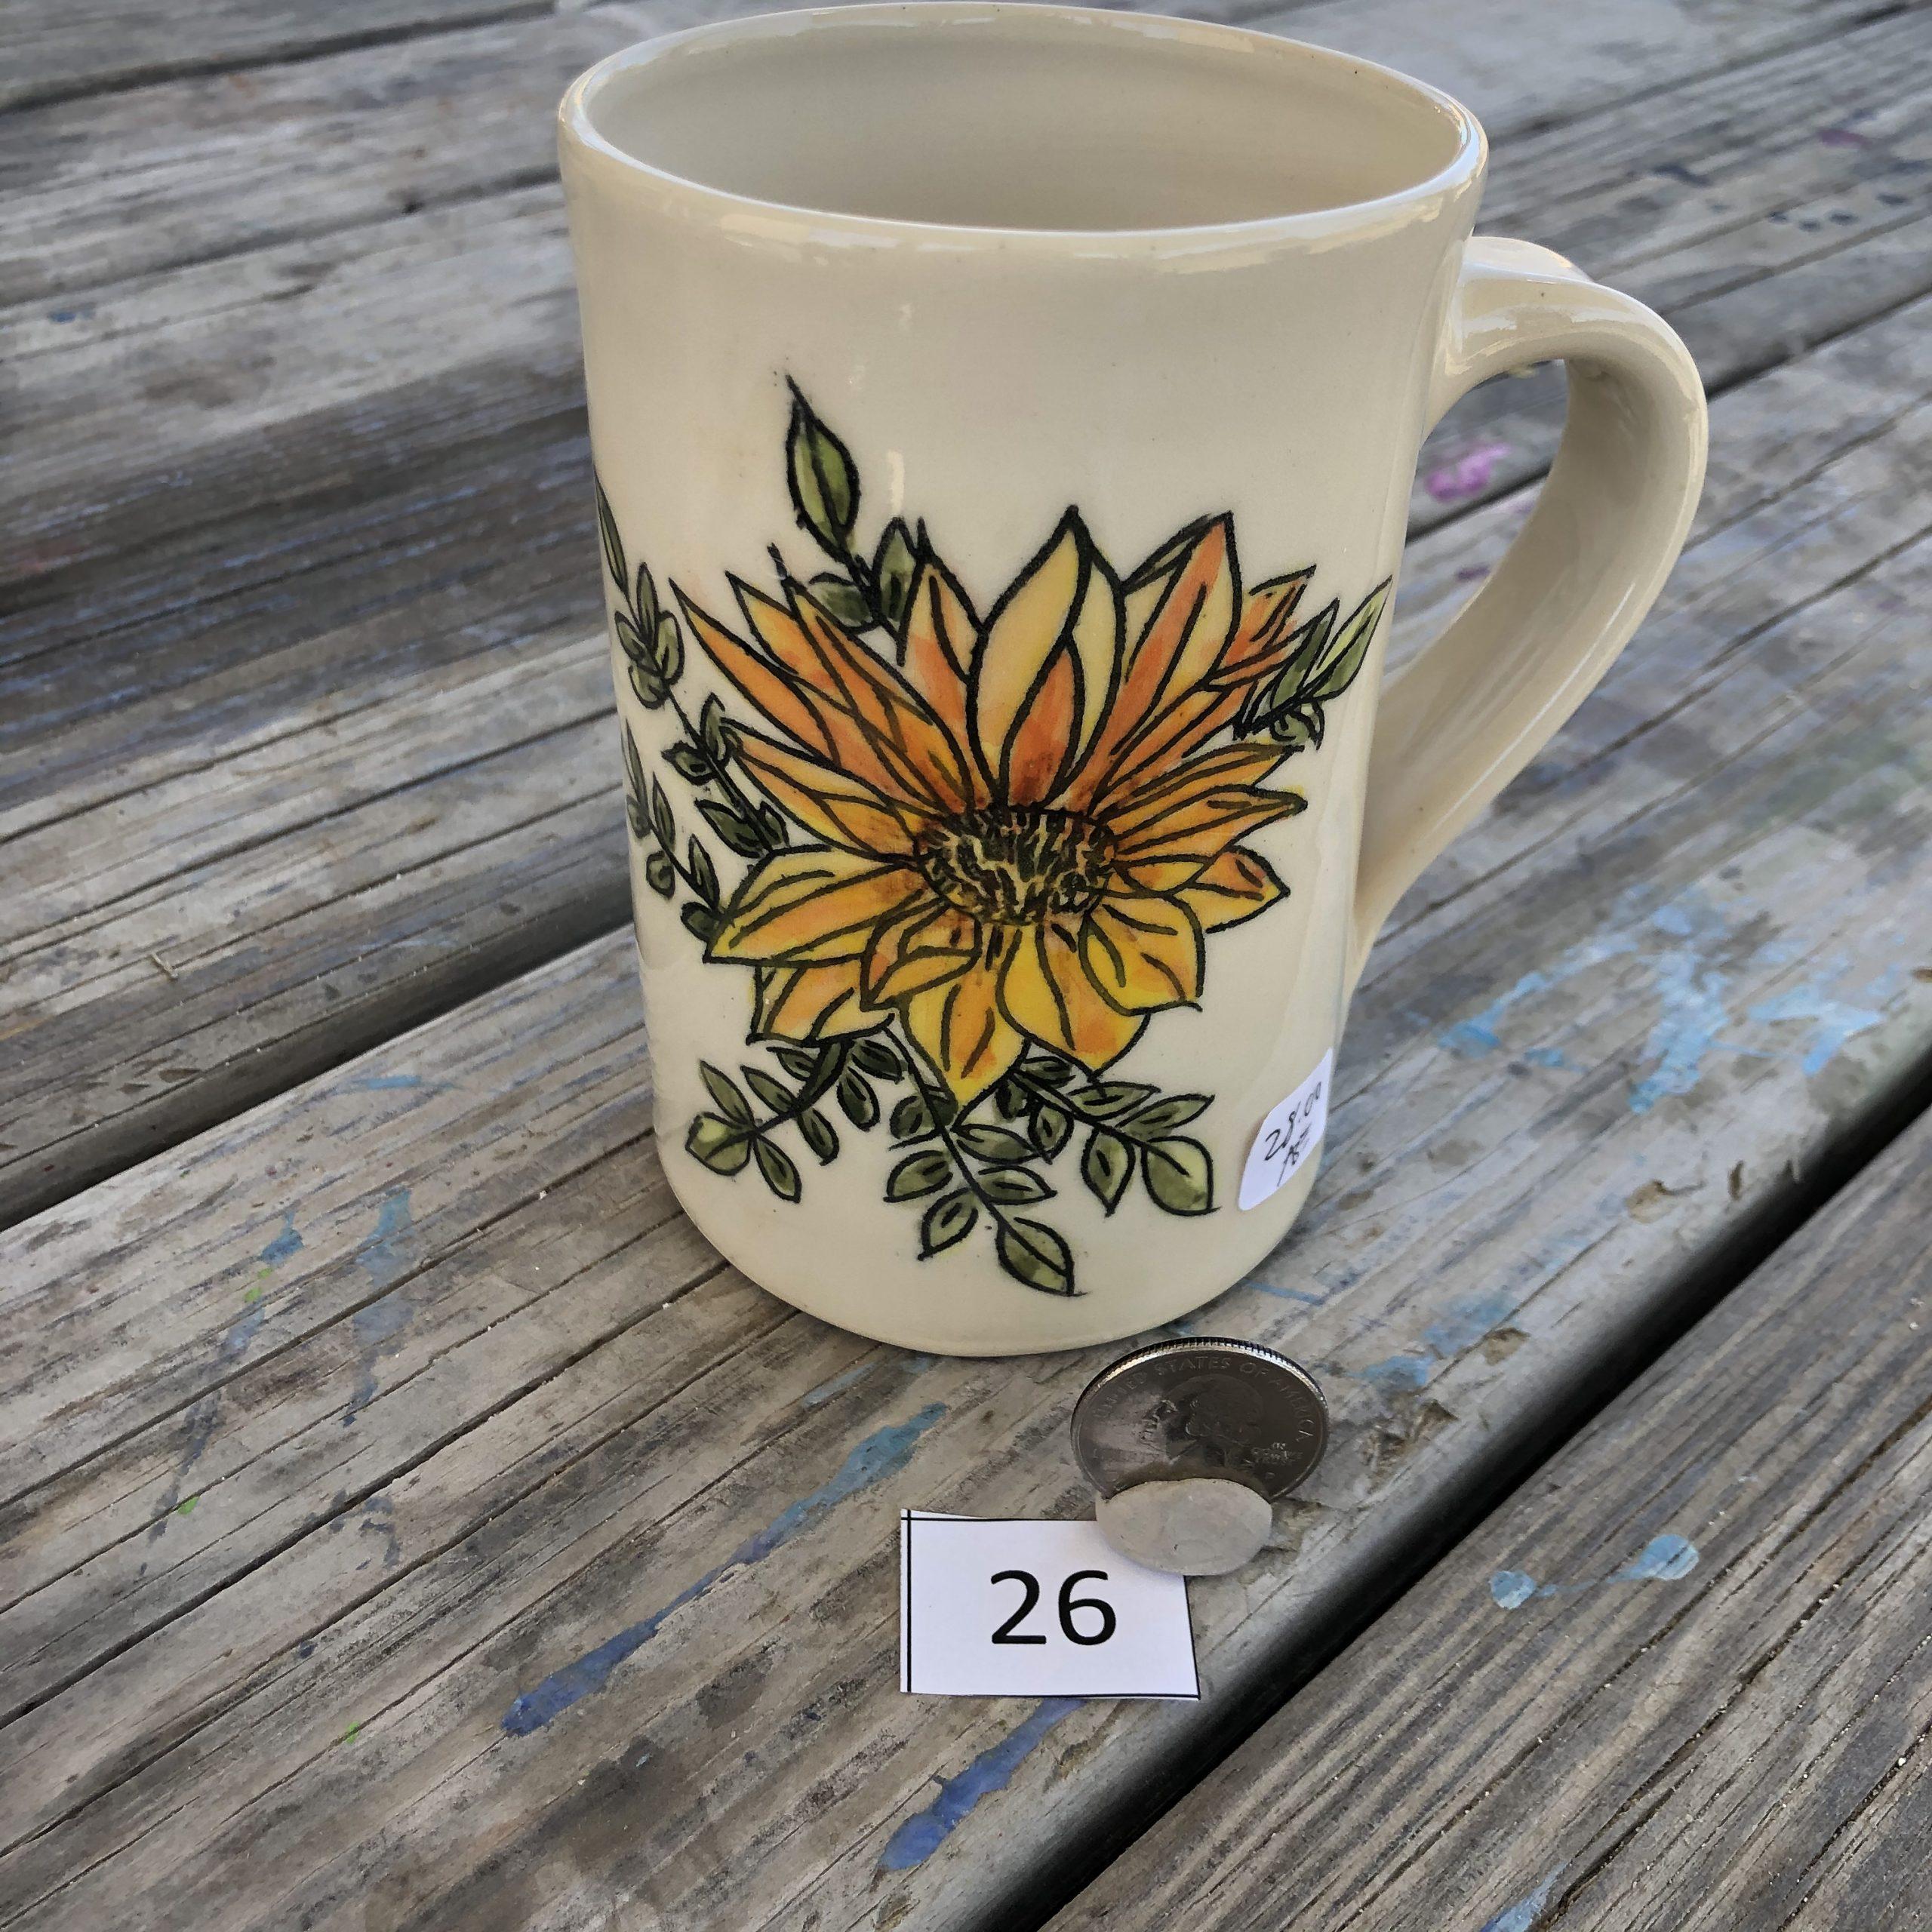 Ana Brugos Flower Mug #26